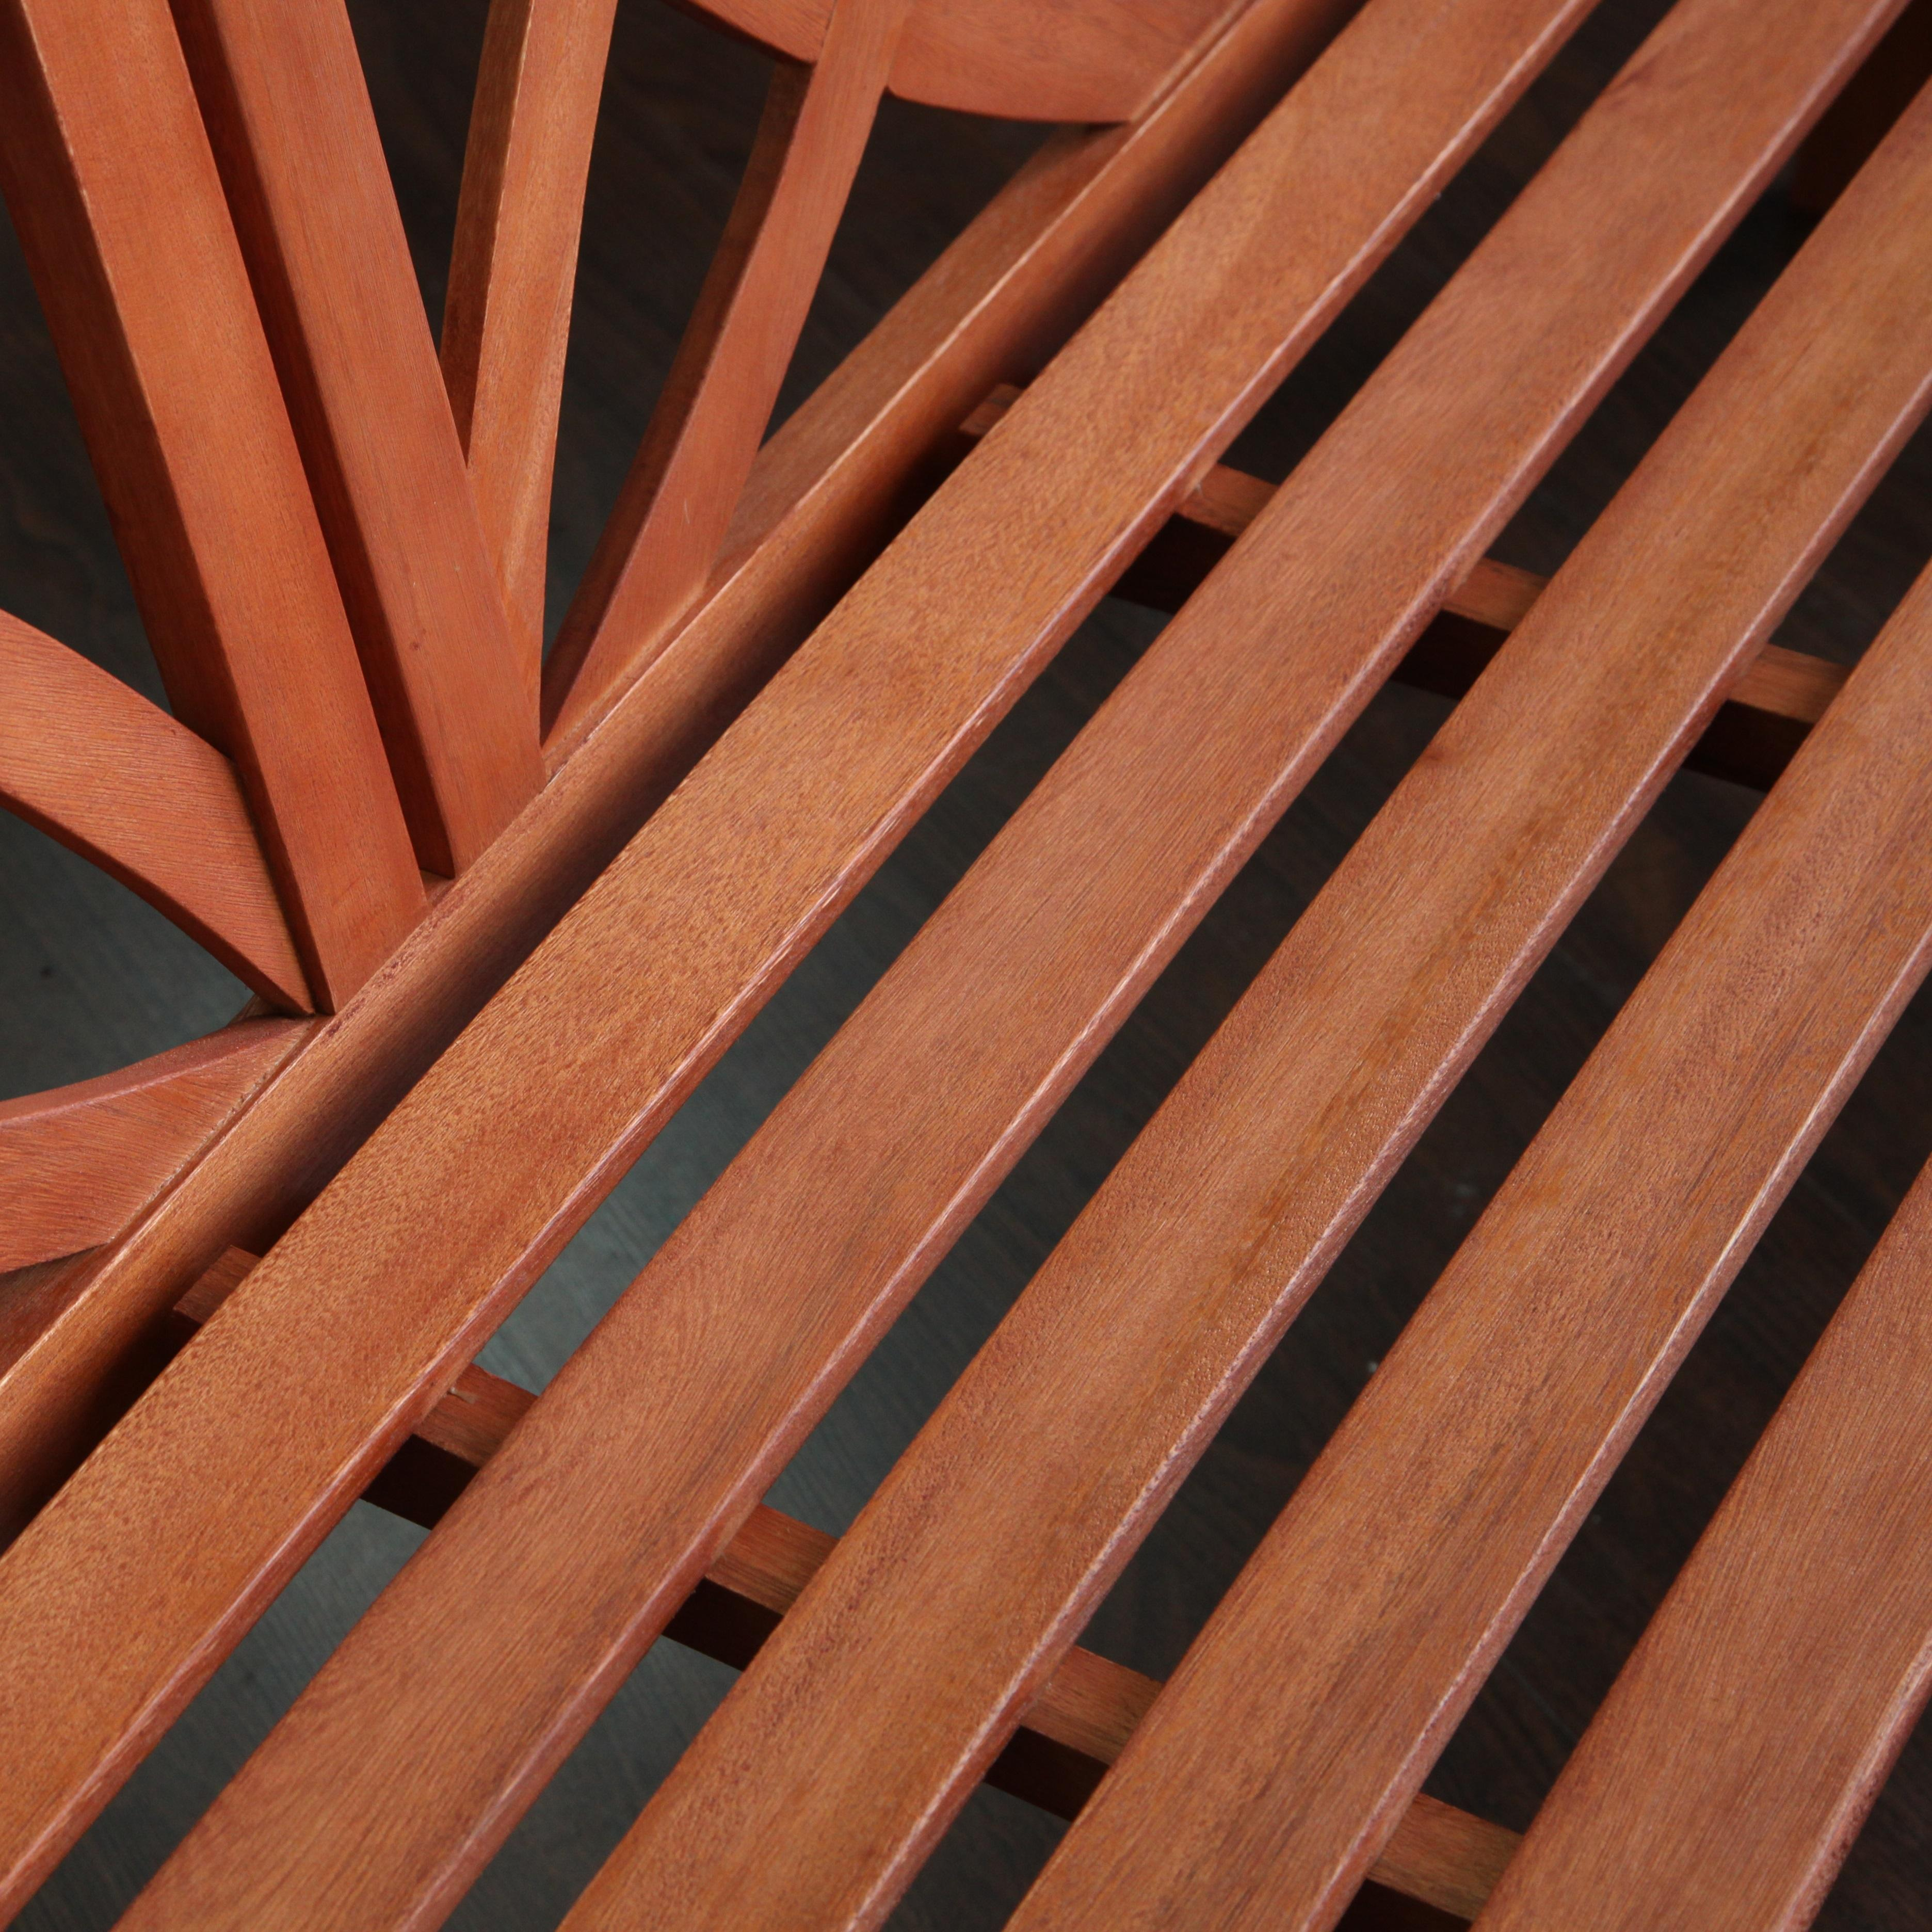 Amazonia Teak Newcastle Teak Bench: Amazon.com : Baltic Eco-friendly 5-foot Outdoor Wood Garden Bench : Garden & Outdoor